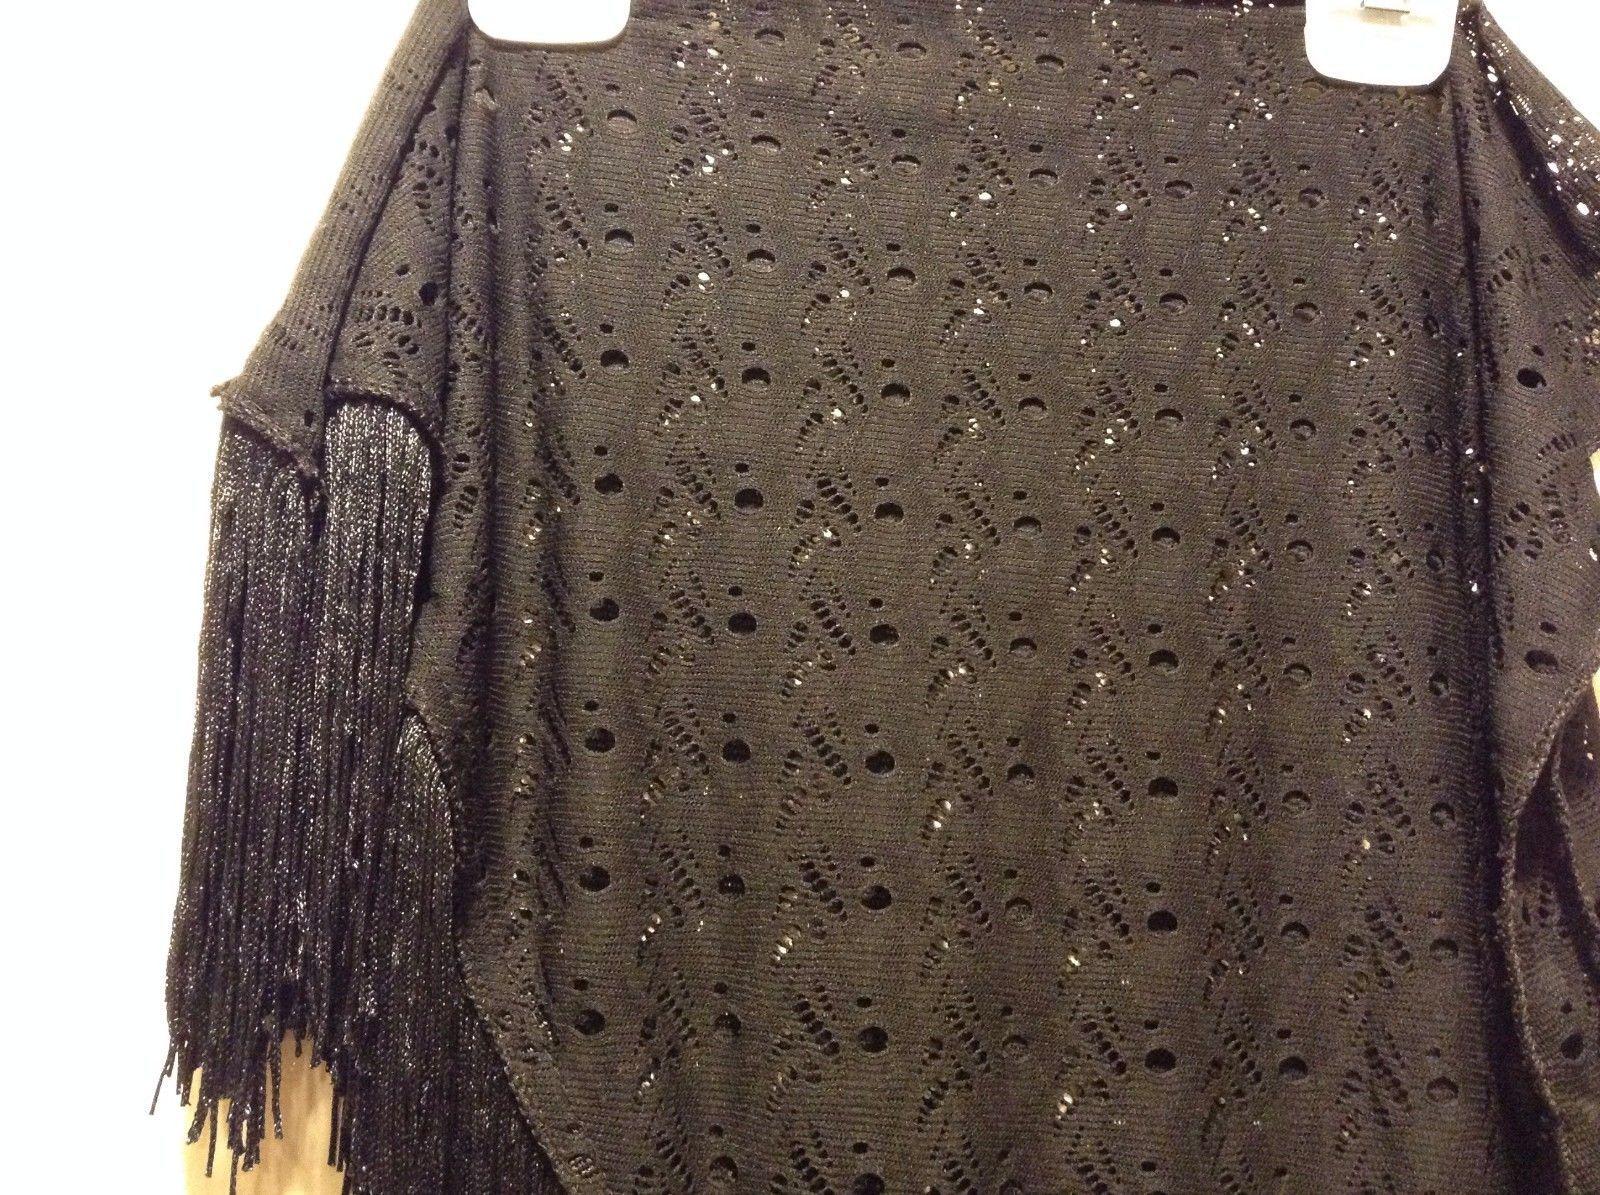 Howard's 100% Polyester Black Triangular Scarf With Fringe Trim